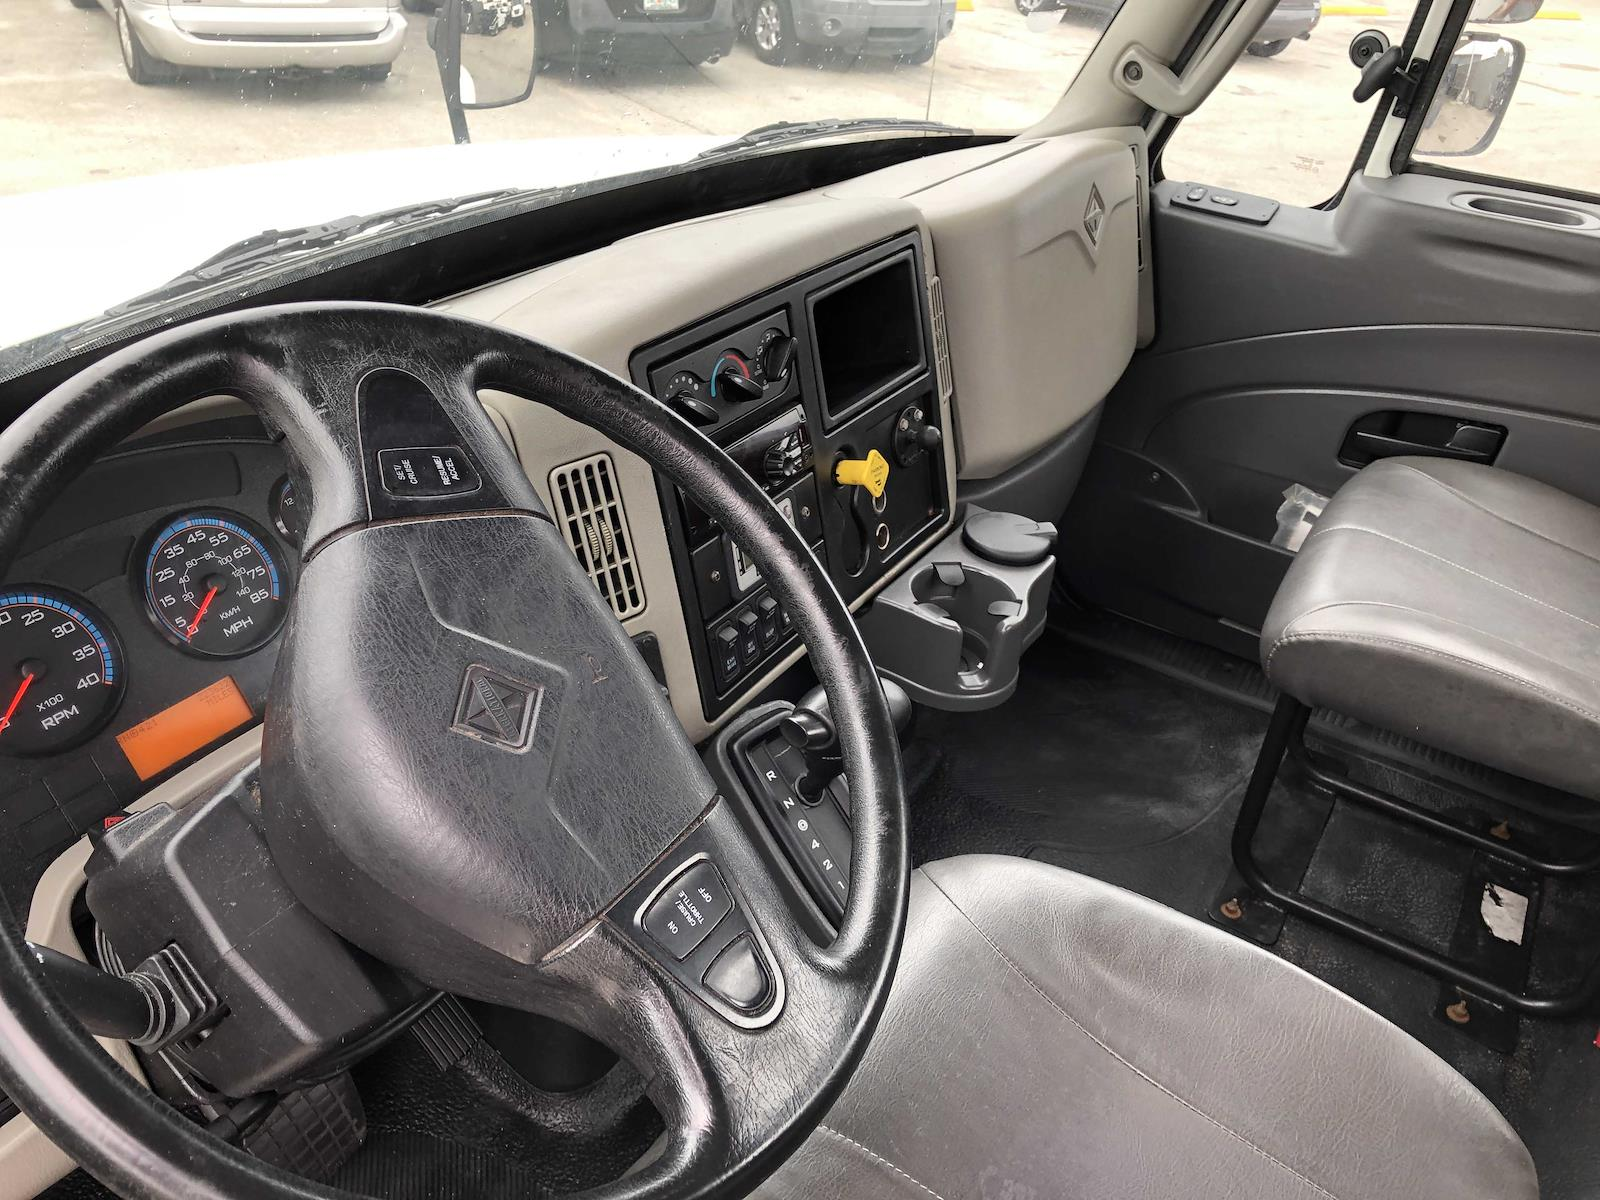 2016 International DuraStar 4300 4x2, Cab Chassis #I-8629 - photo 11